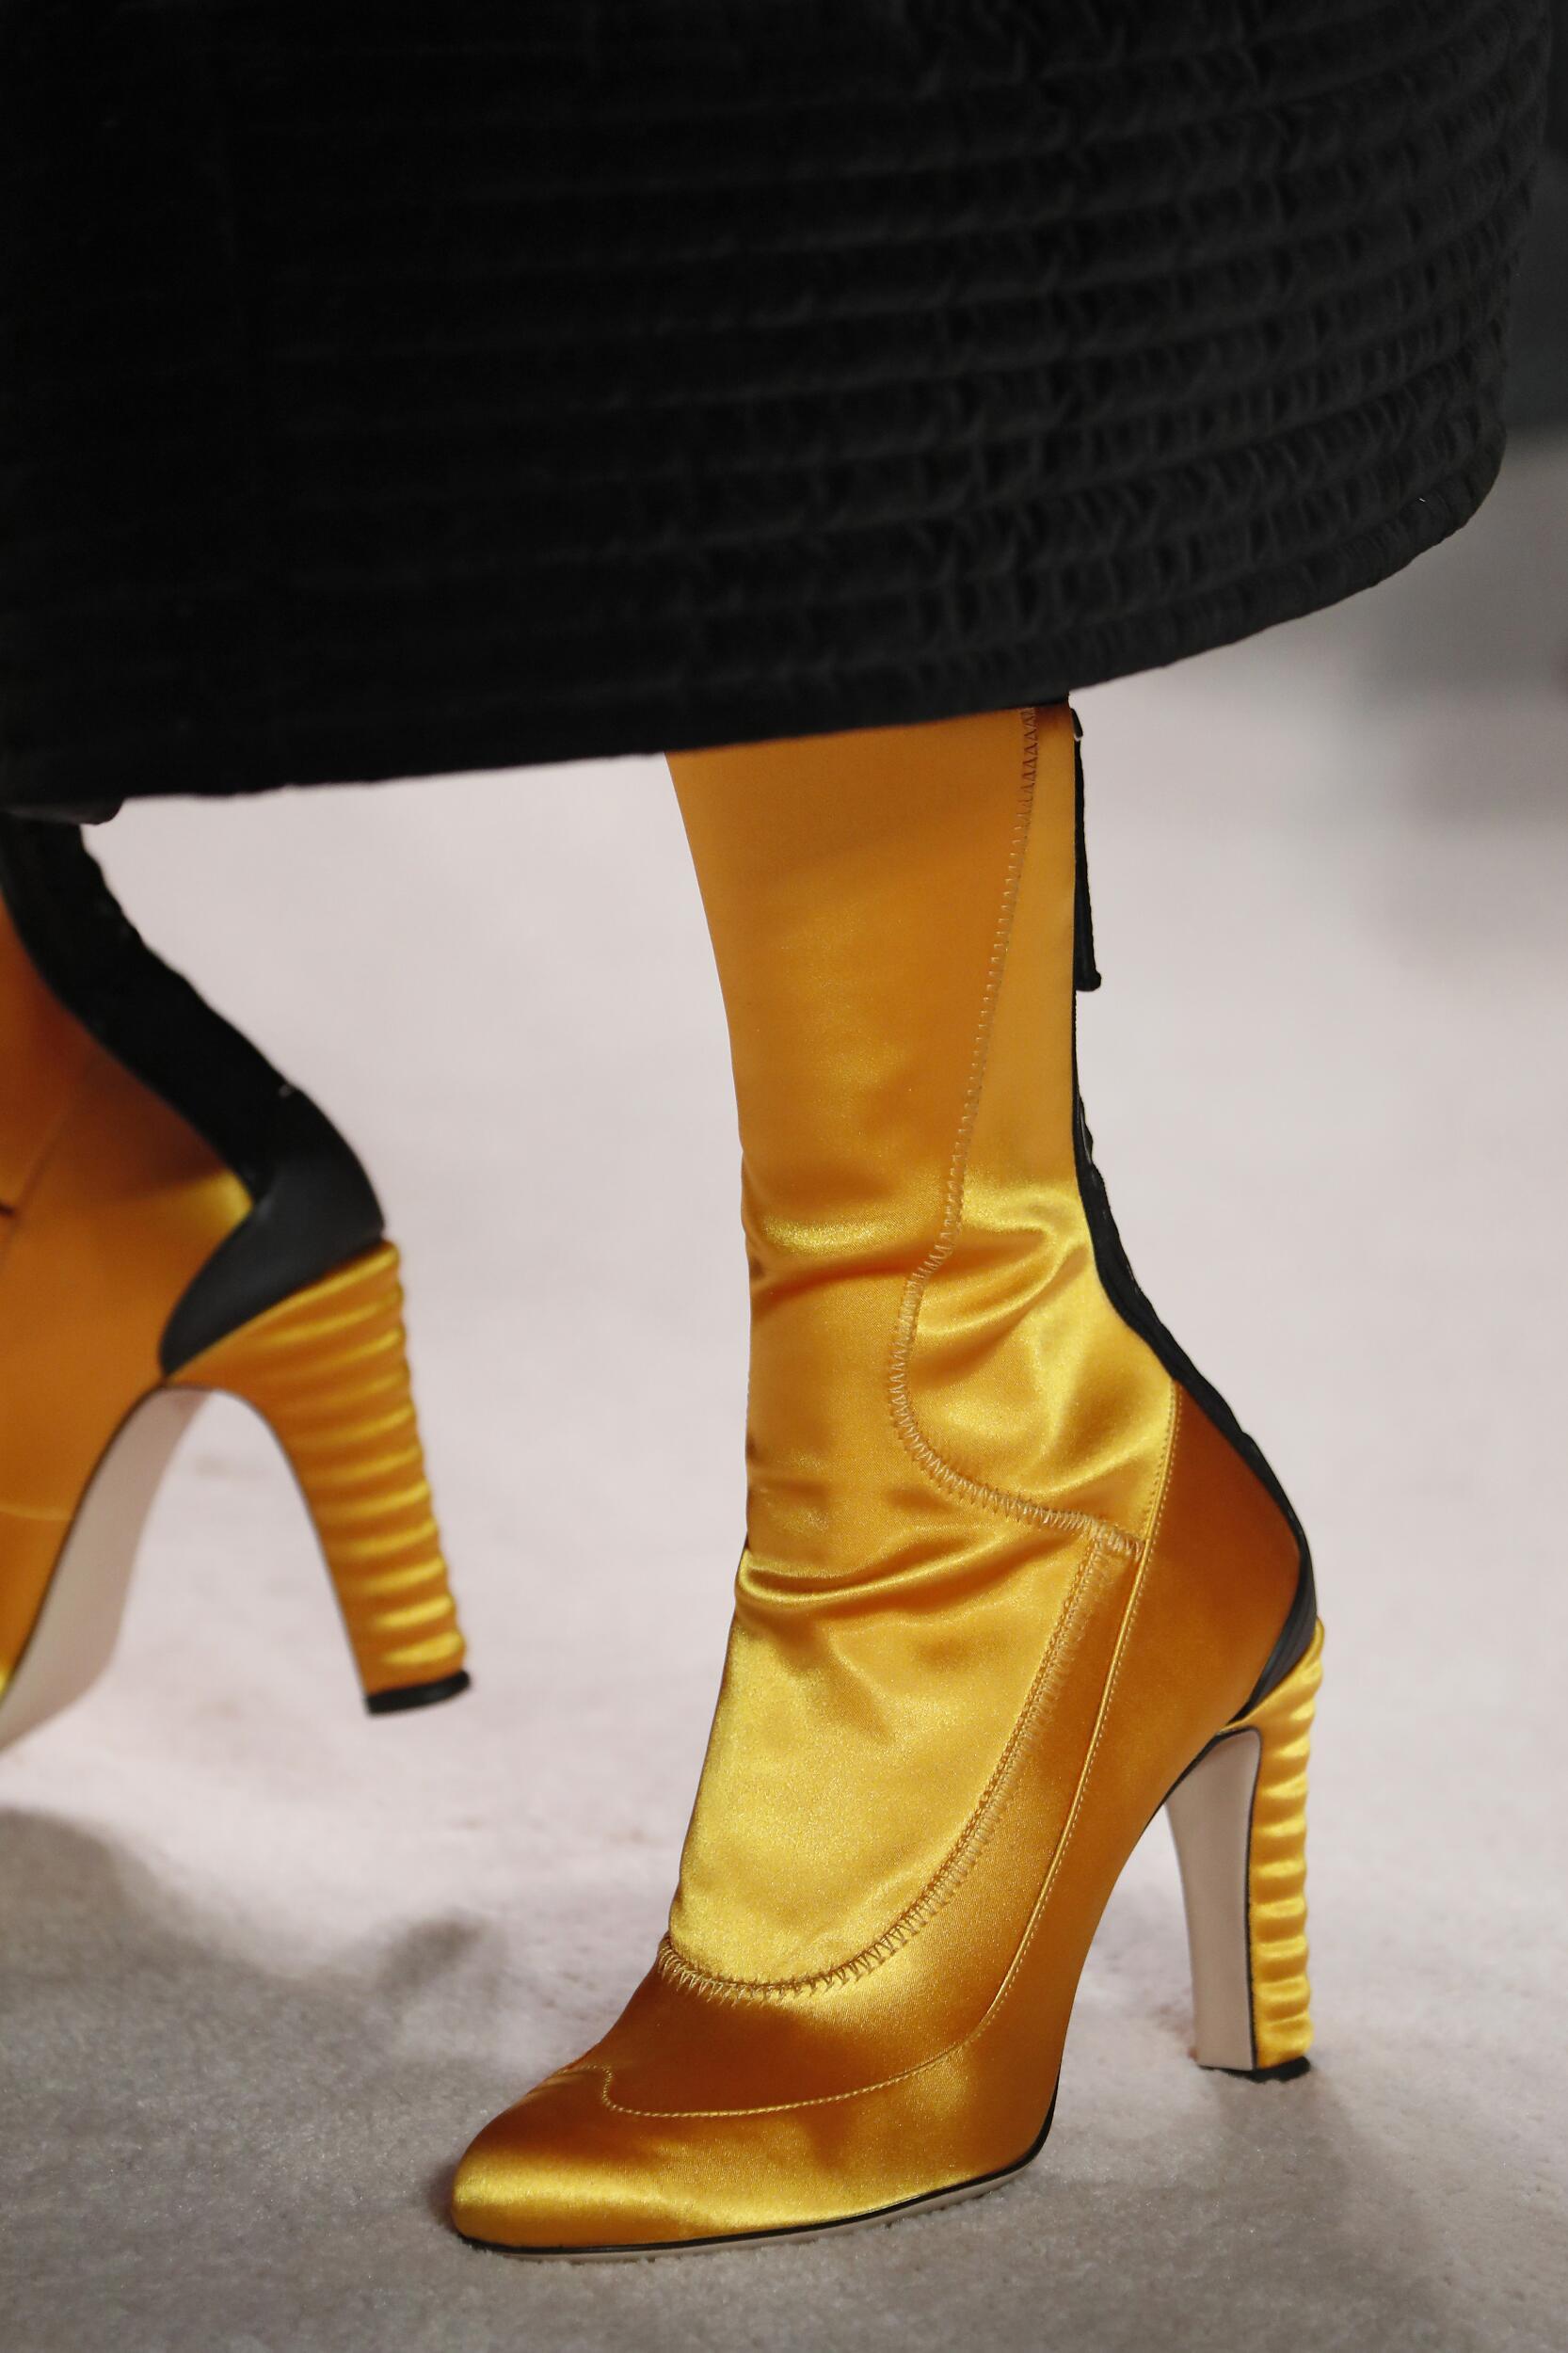 2020 Shoes Fendi